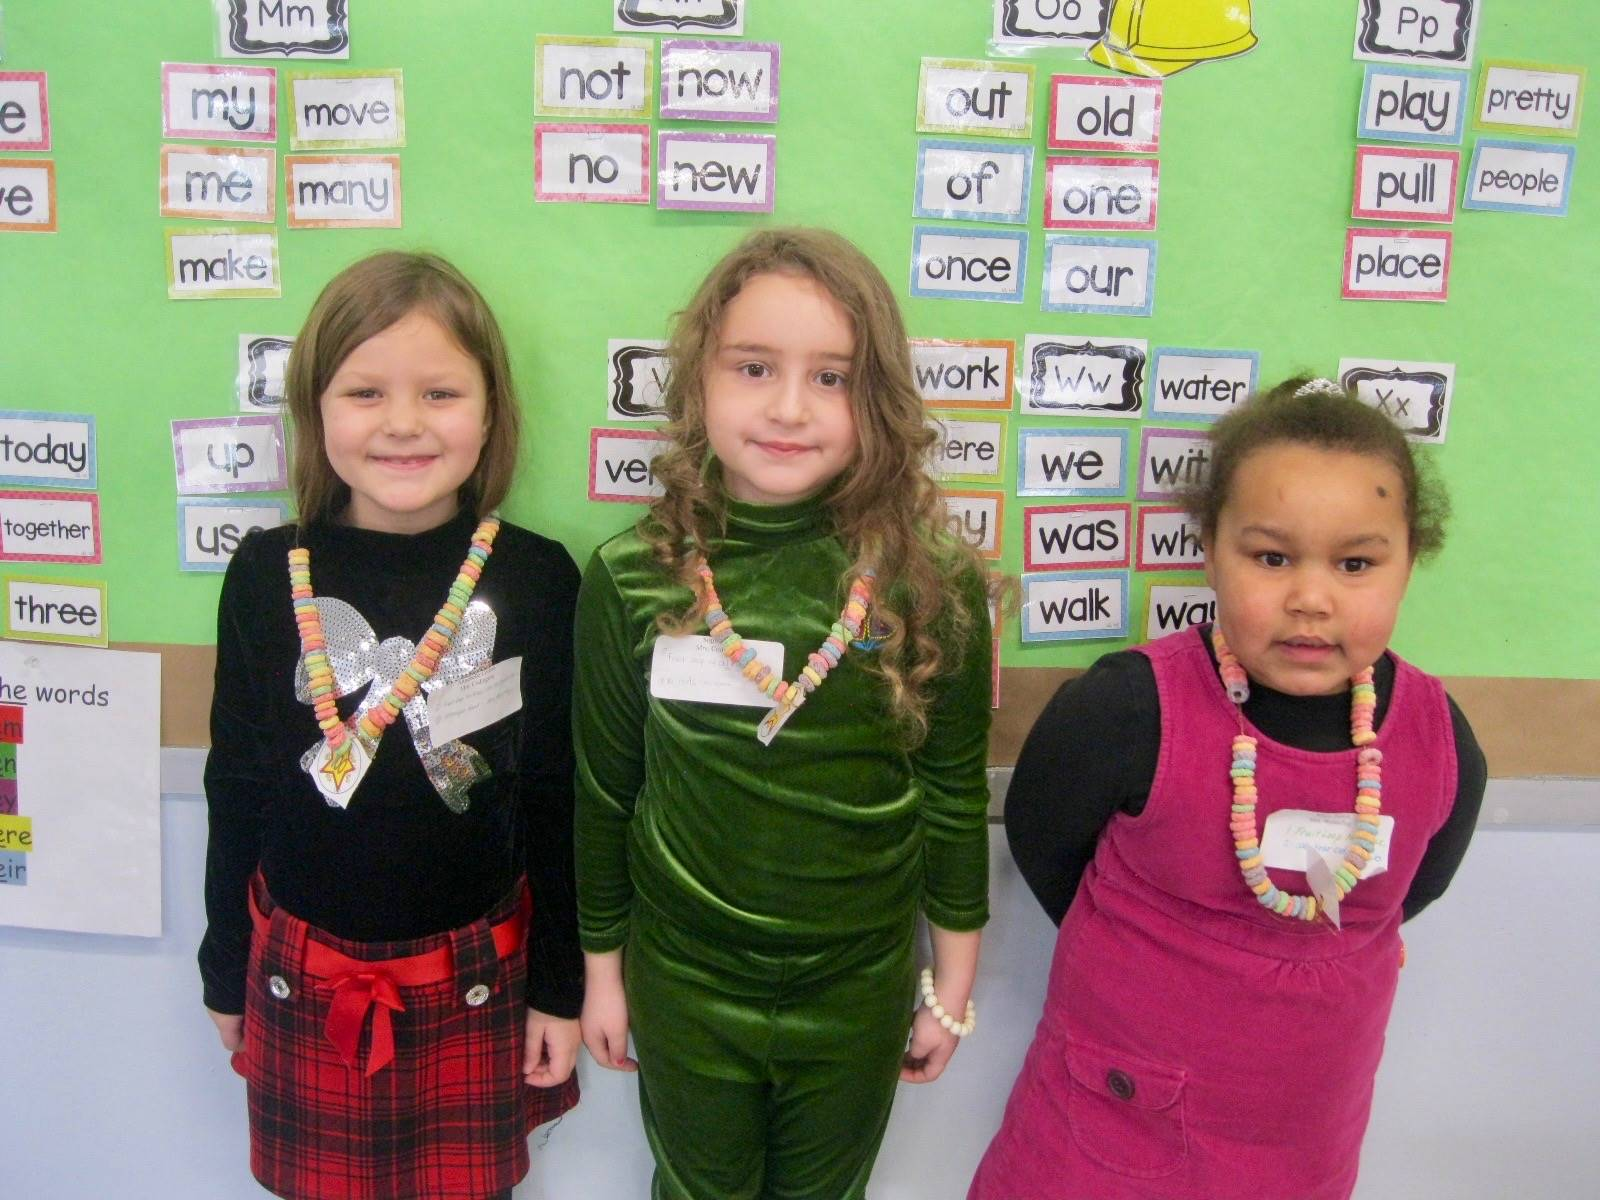 3 students show 100 piece necklace.